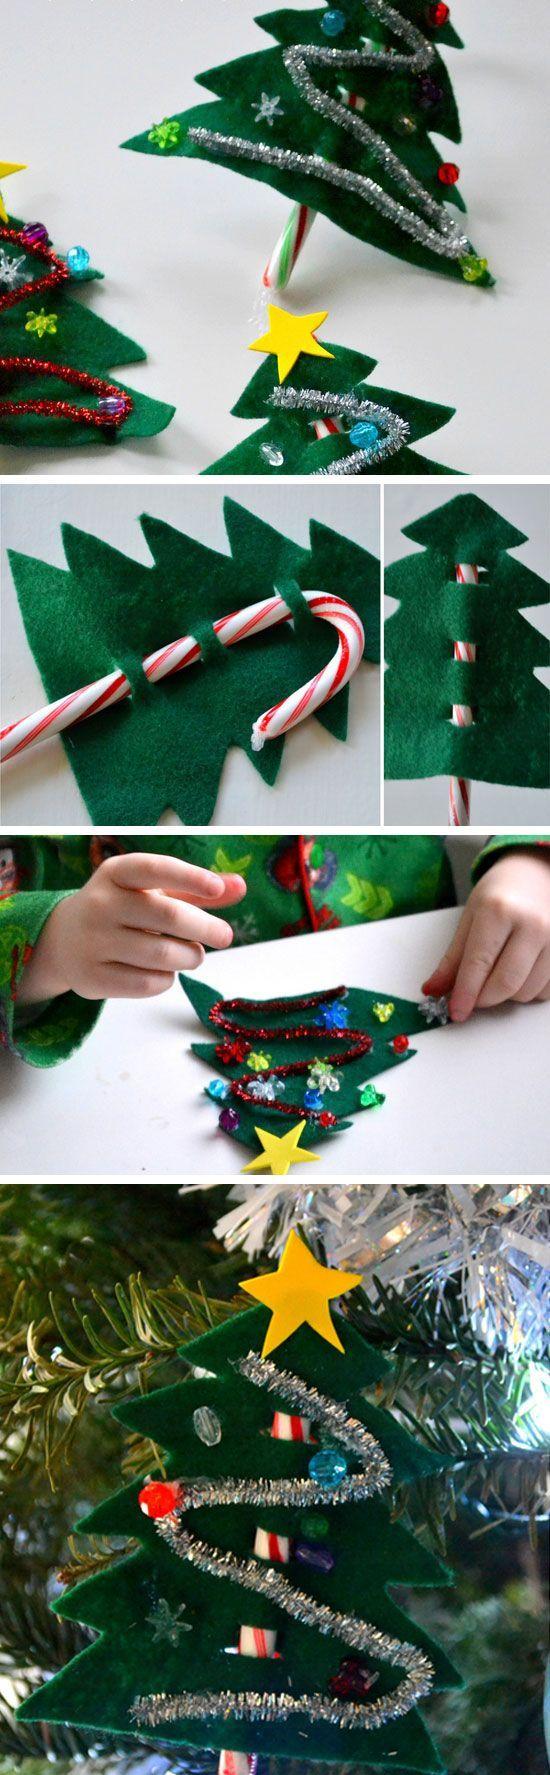 Best 25+ Candy Christmas Trees Ideas On Pinterest  Whimsical Christmas,  Whimsical Christmas Trees And Gingerbread Christmas Decor